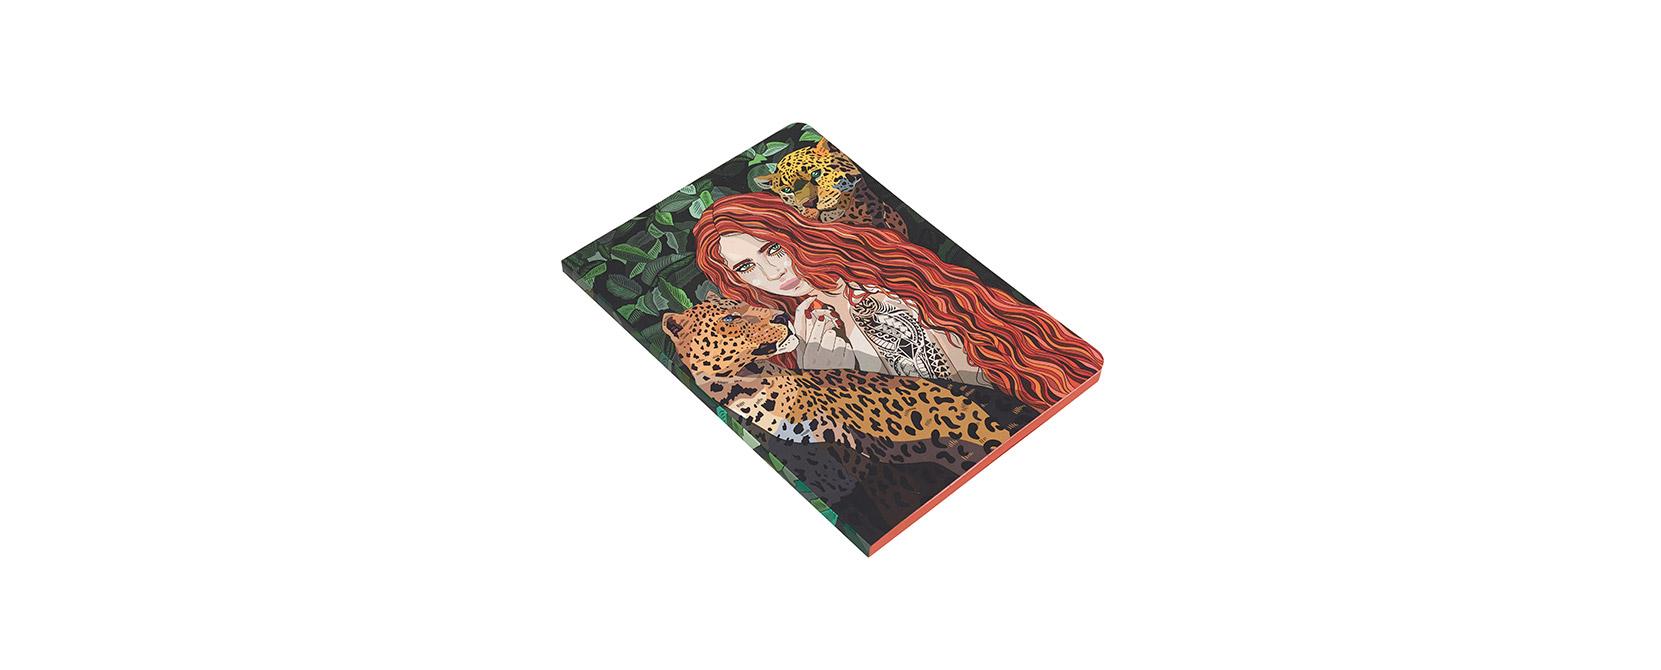 Cuaderno ilustrado Gertrude - Reina de Diamantes